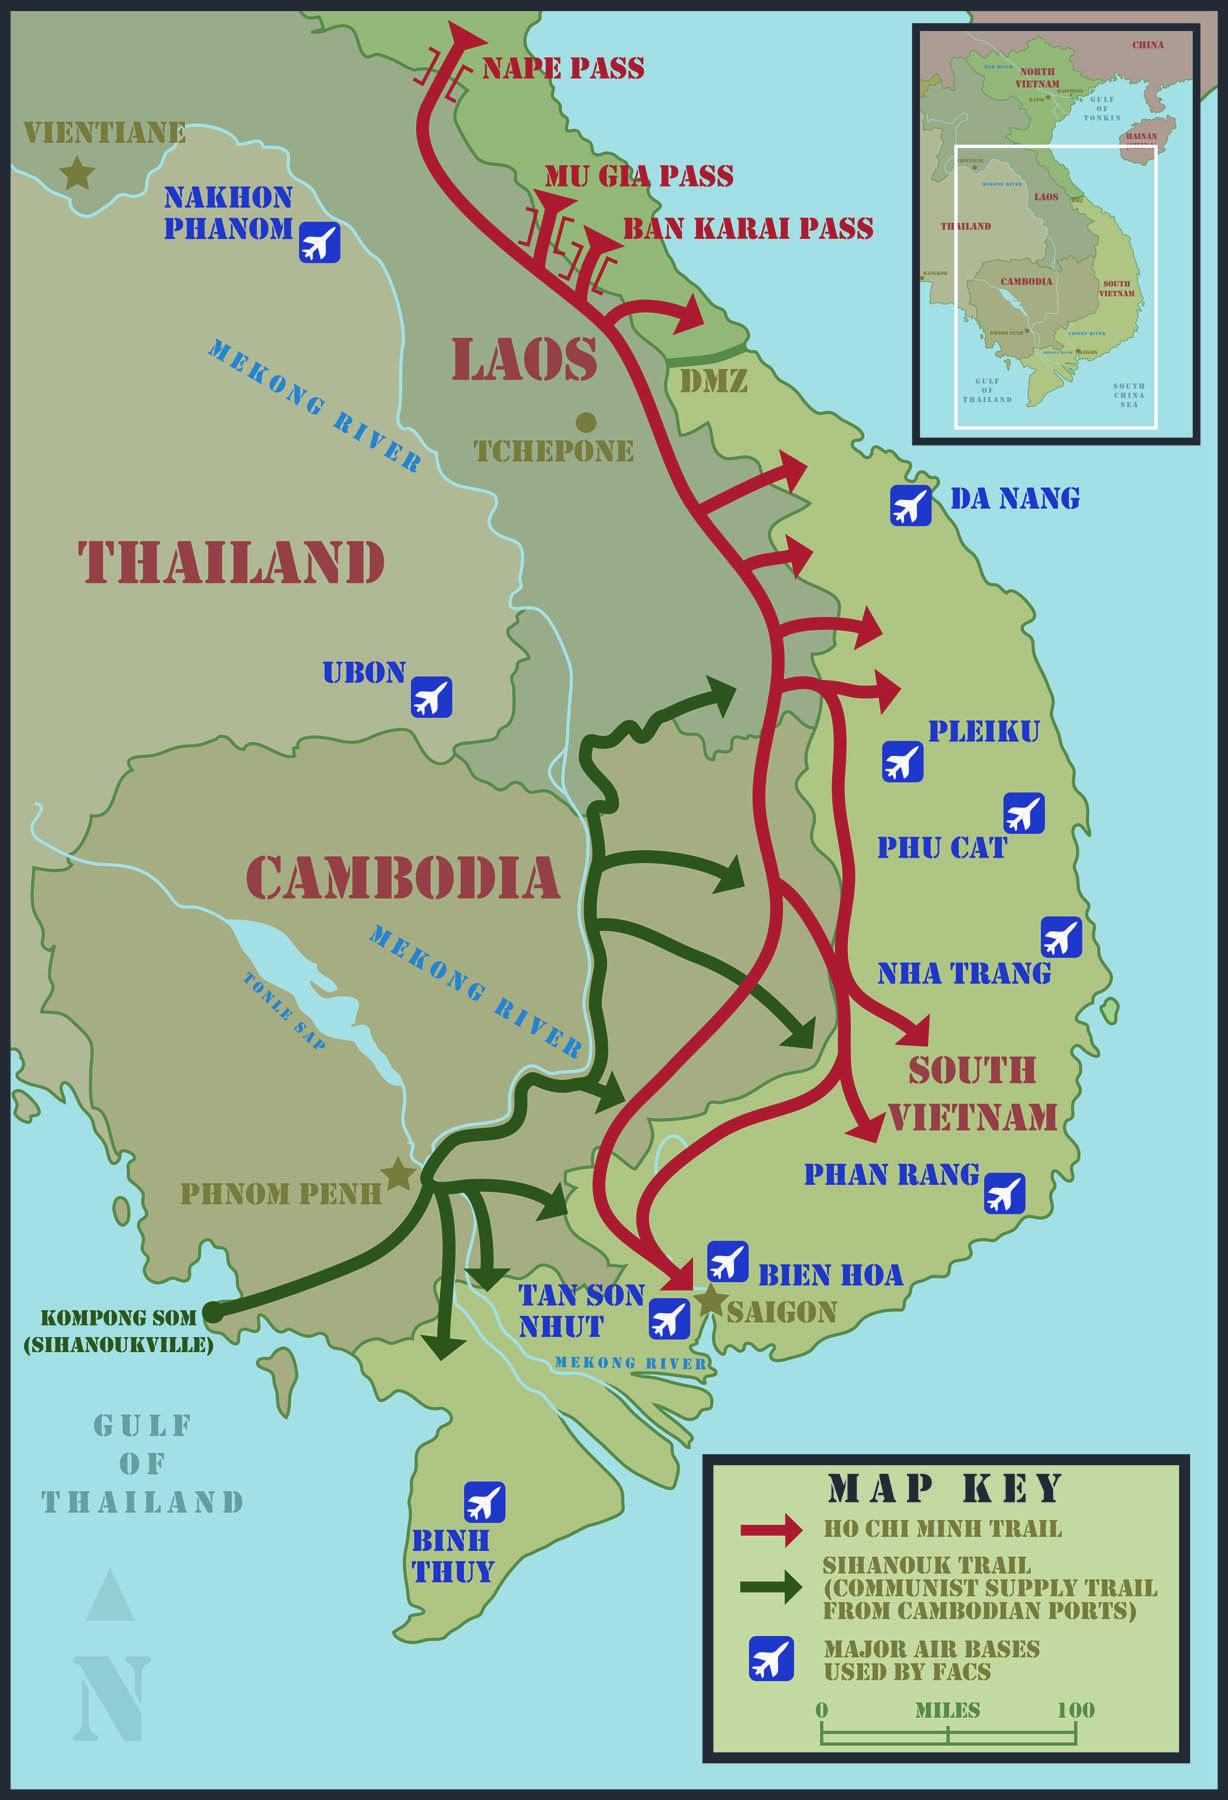 Ho Chi Minh Trail Highway 9 Khe Sanh Combat Base Military Stuff